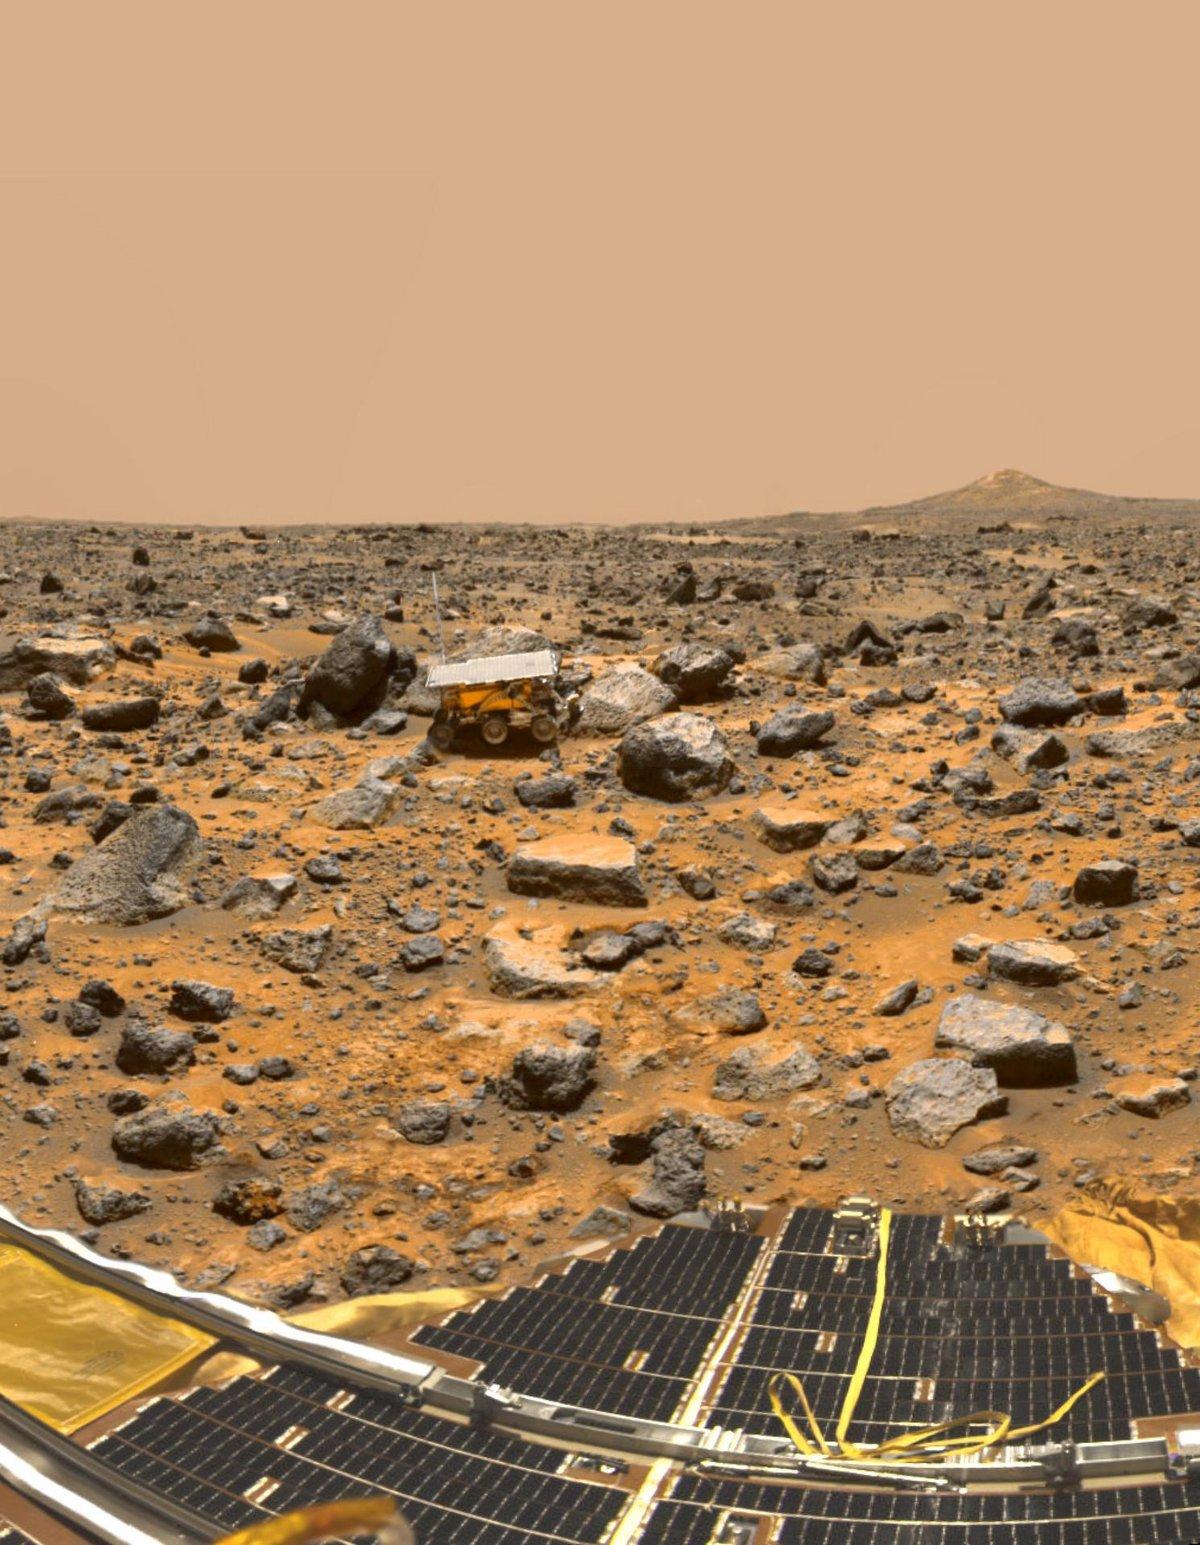 Mars Pathfinder © NASA/JPL